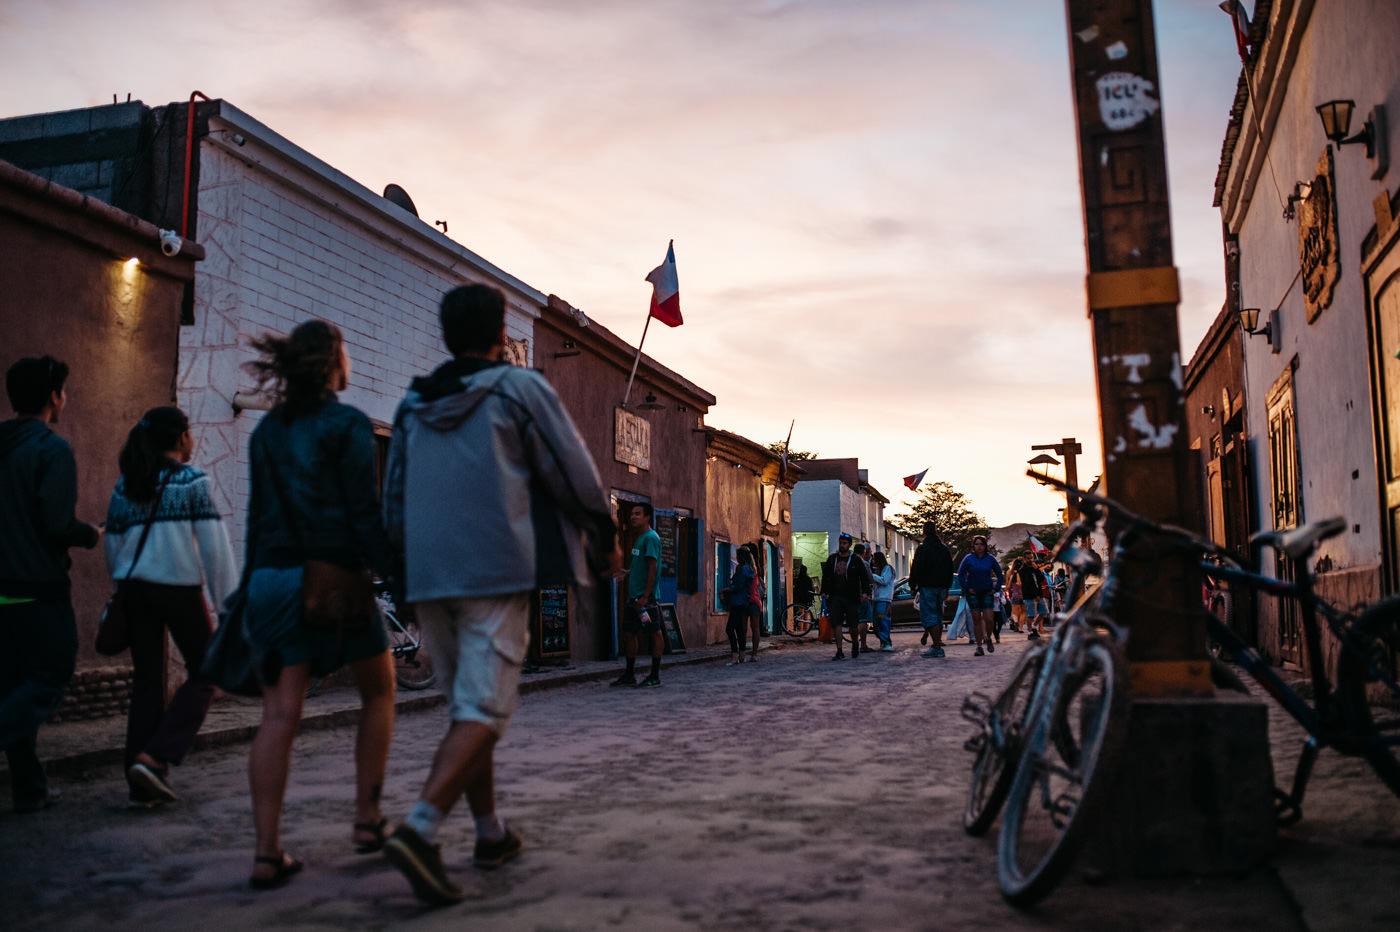 Chile San Pedro de Atacama busy street at sunset